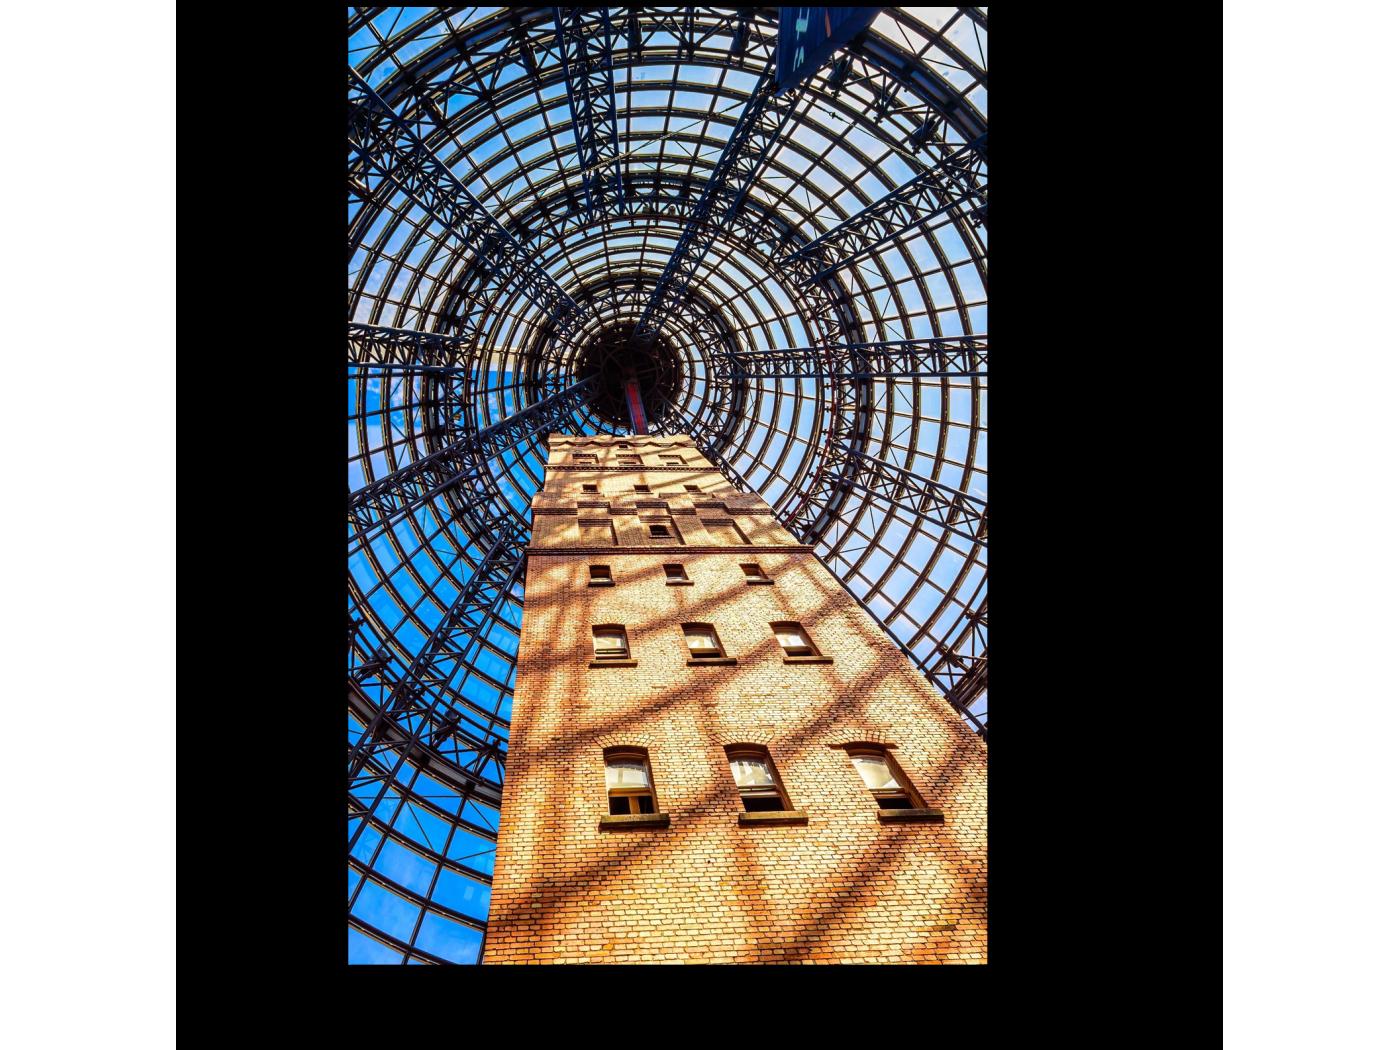 Модульная картина Центральная башня Мельбурна (20x30) фото